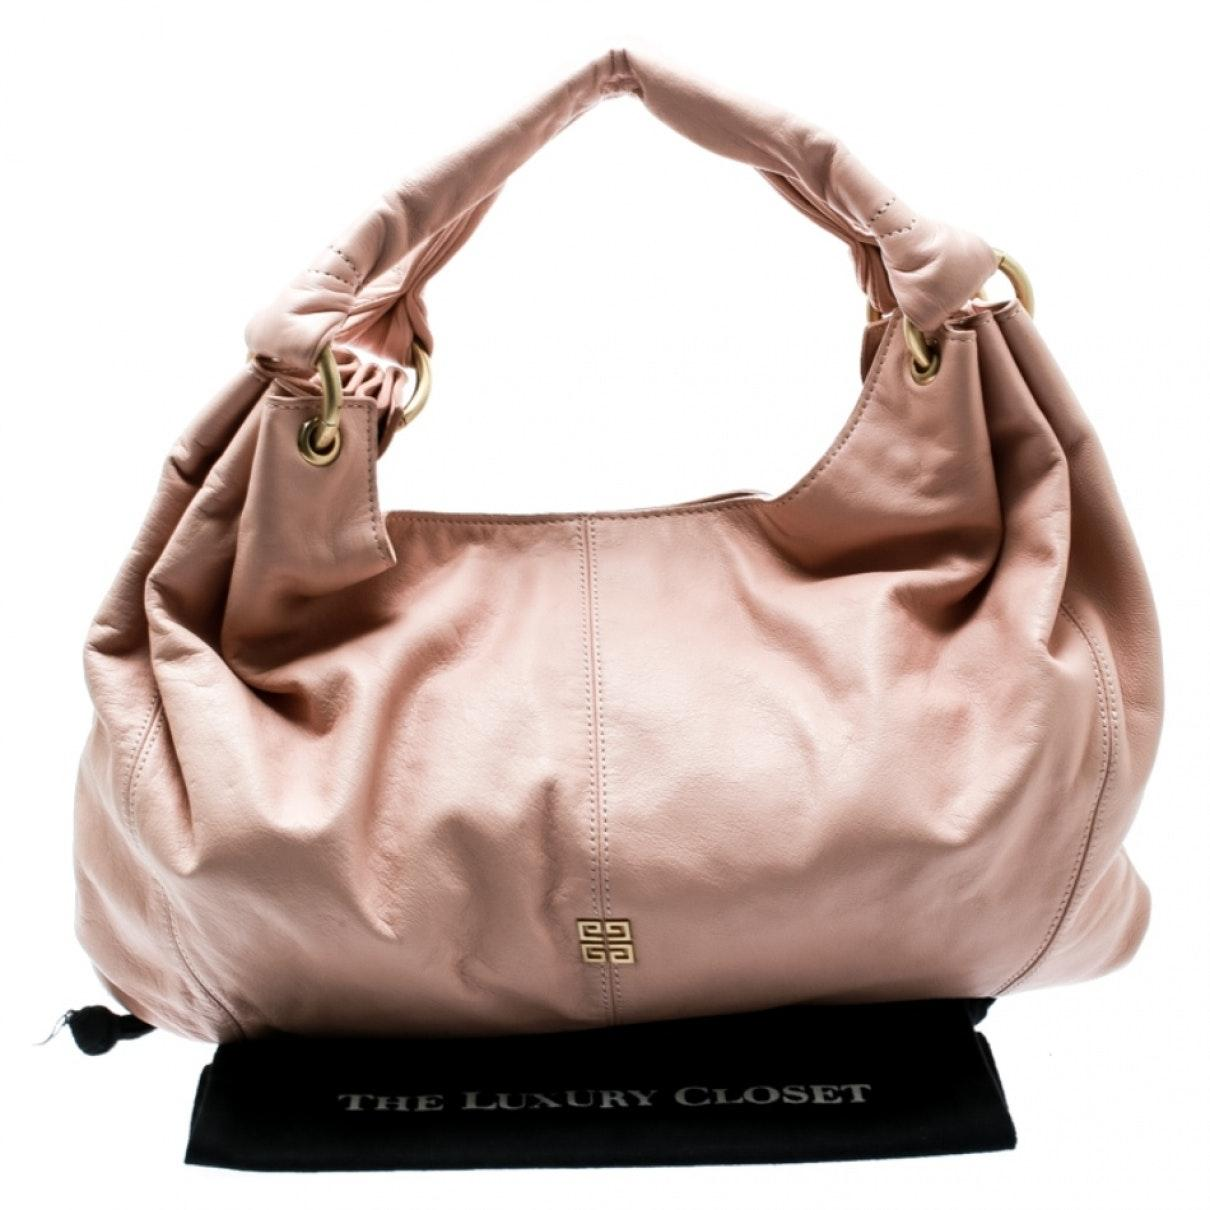 Sac à main en Cuir Rose Cuir Givenchy en coloris Rose VfJn